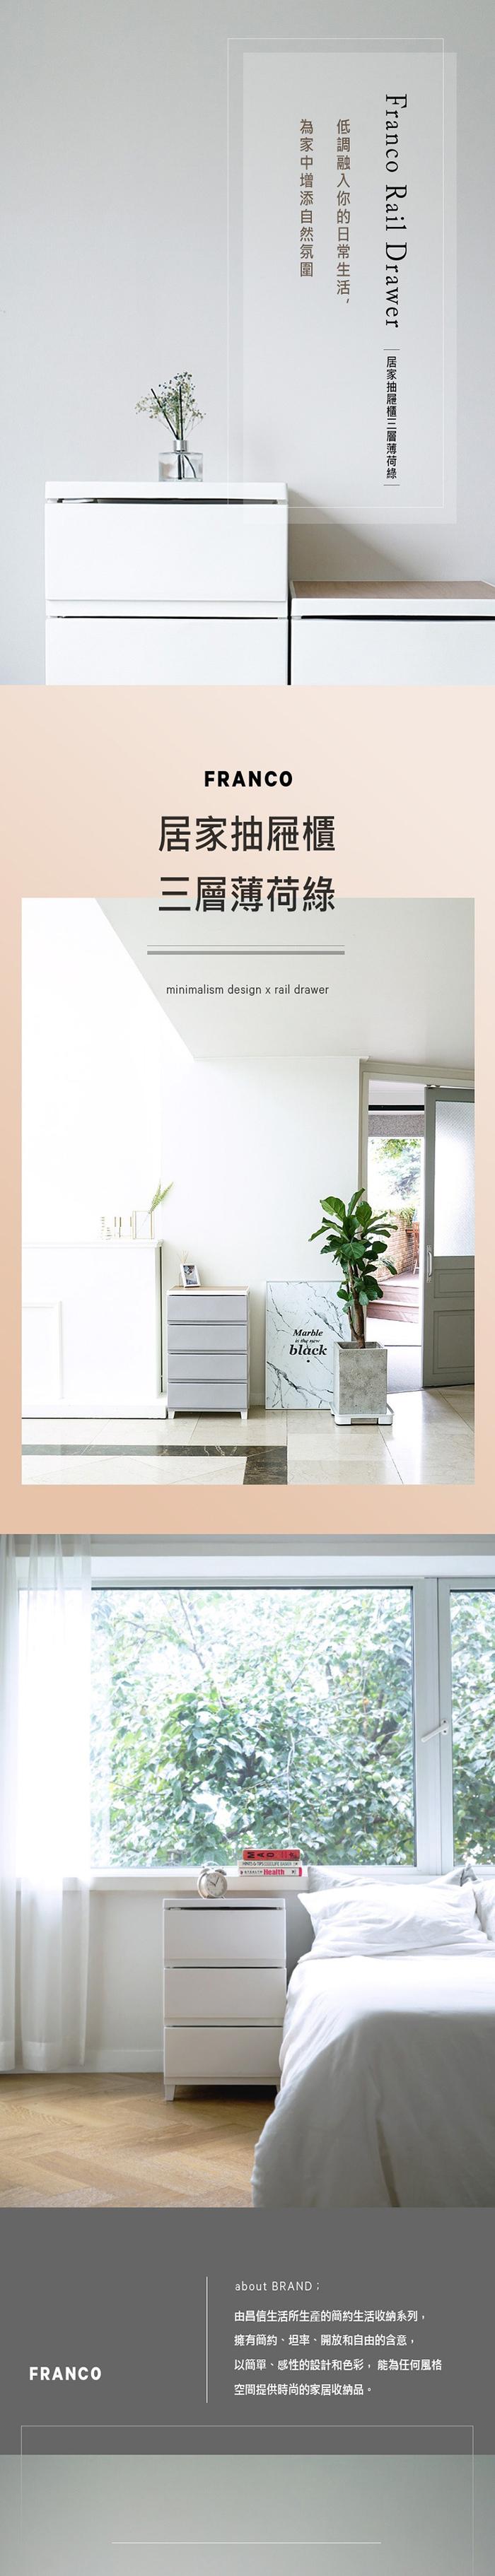 Changsin|FRANCO居家抽屜3層櫃(42cm)(兩色任選)